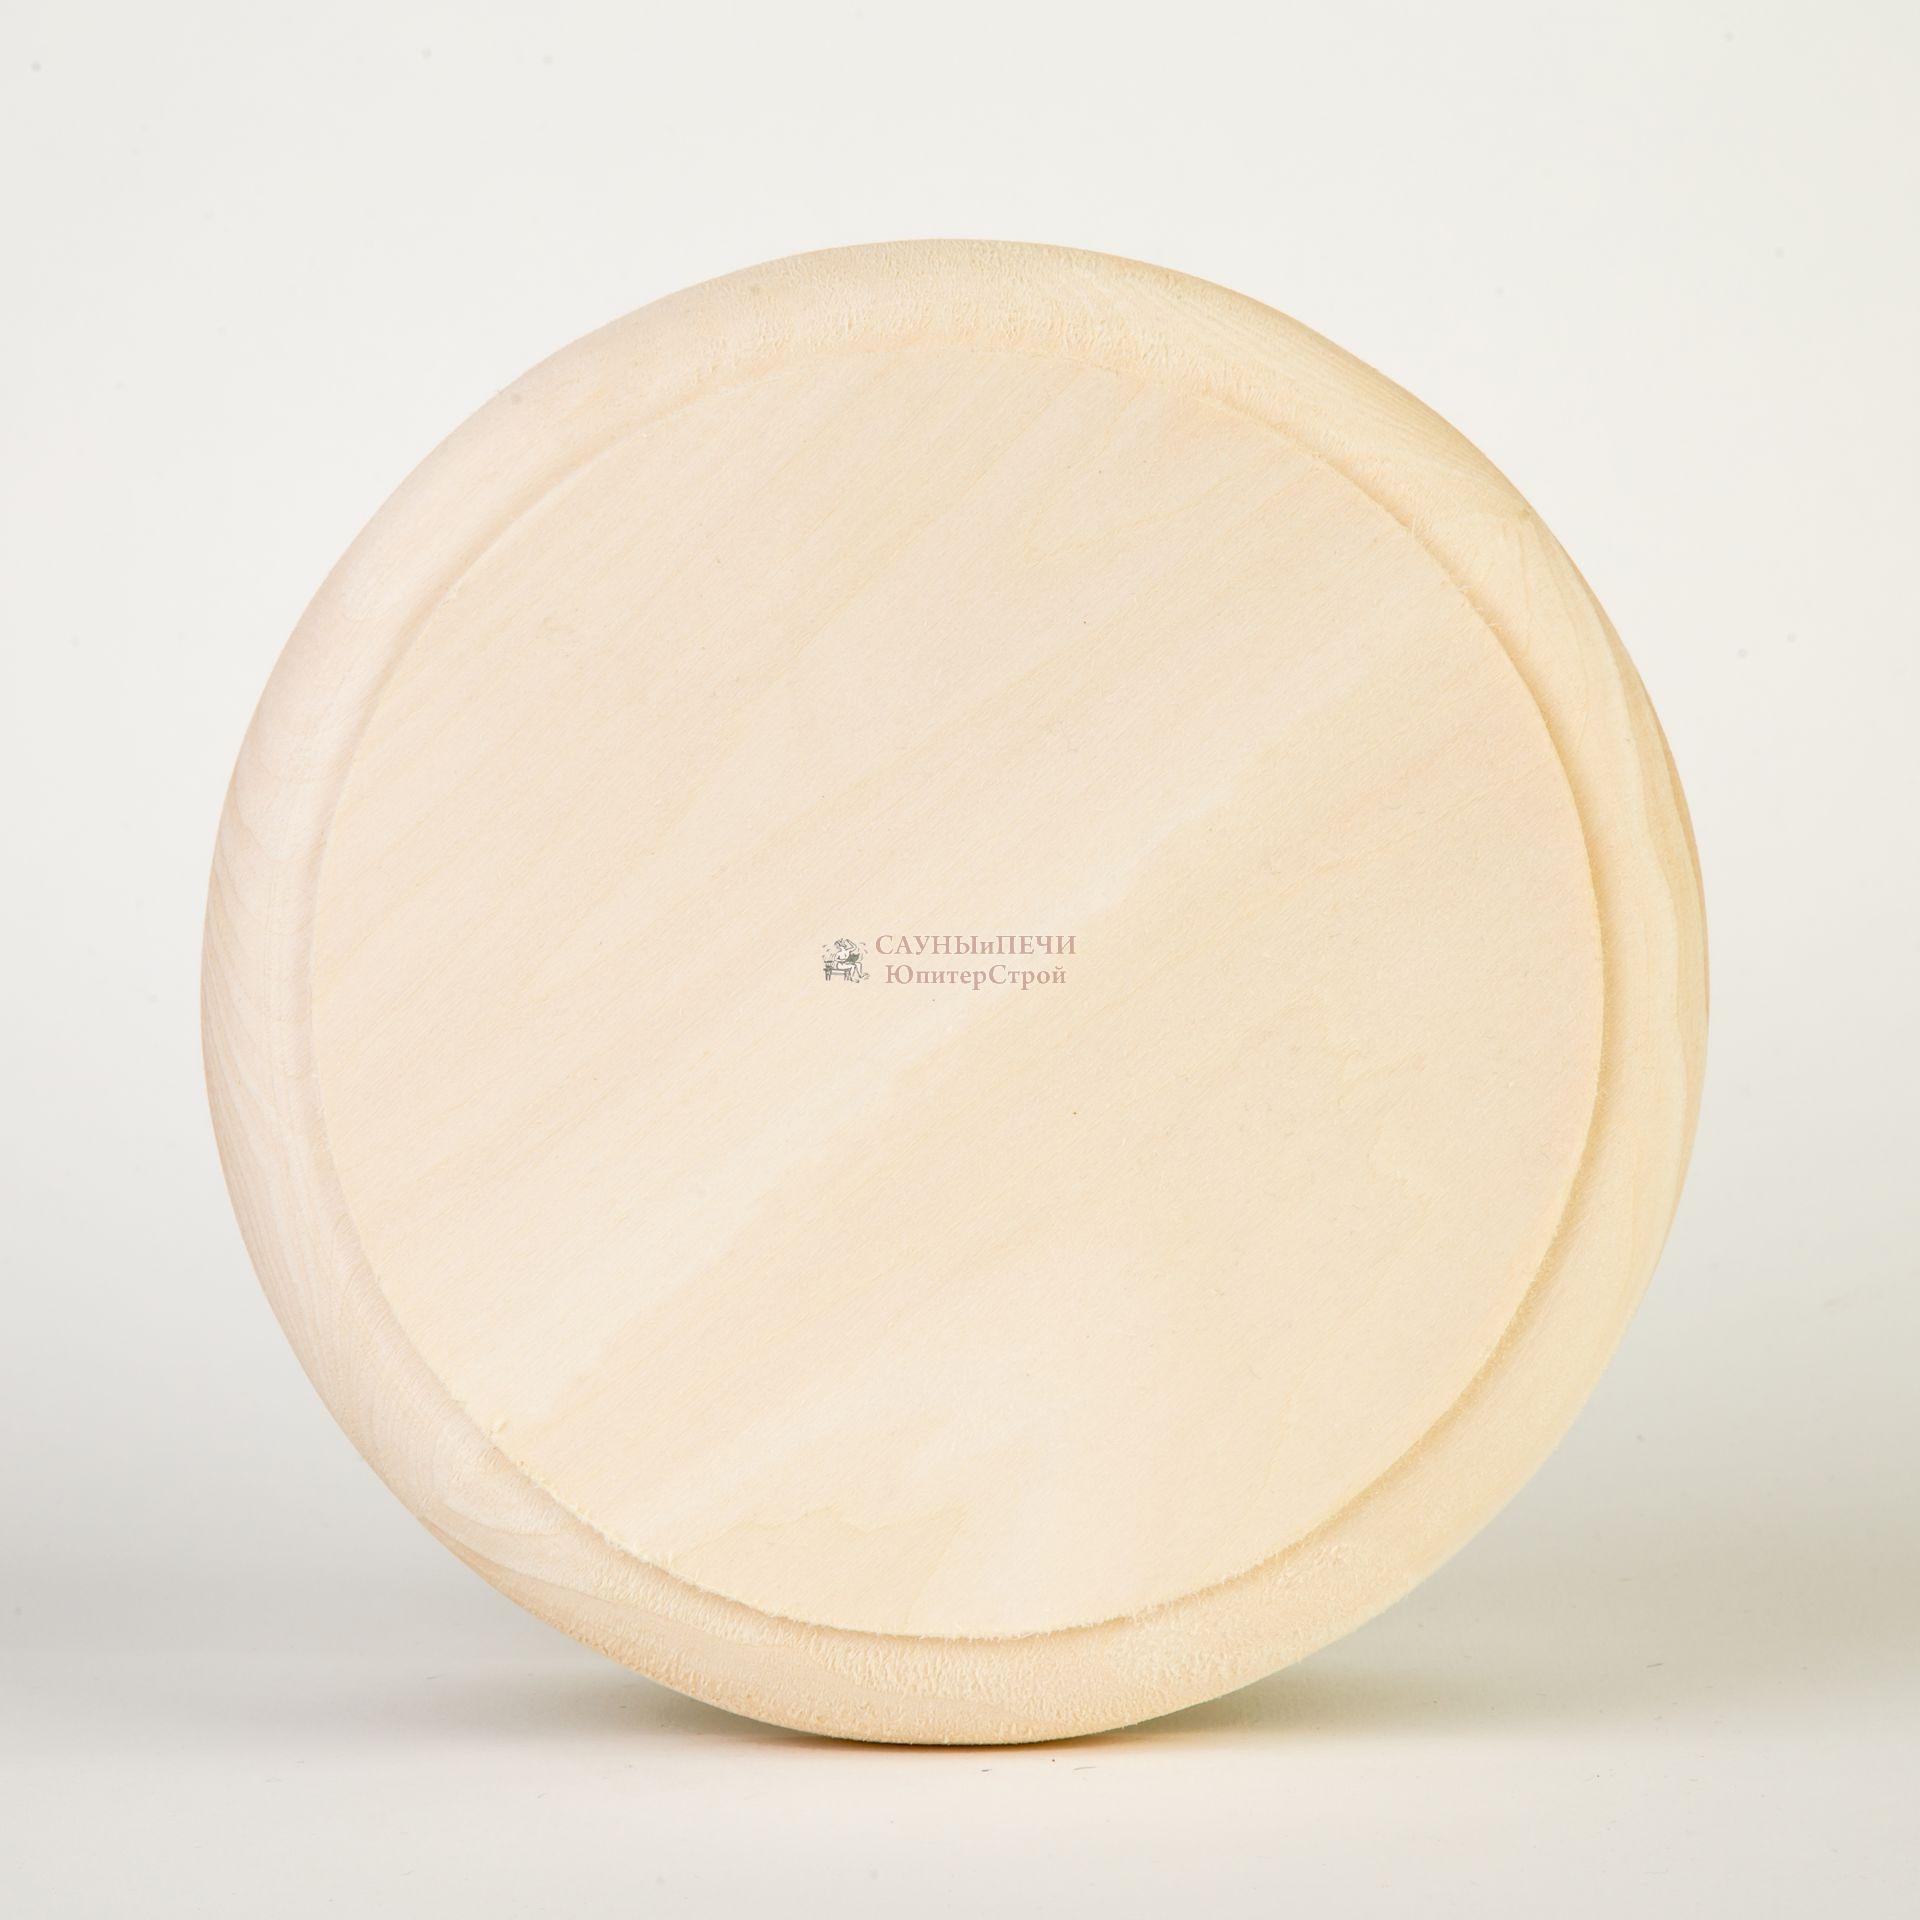 Вентиляционная заглушка D=100 липа (Light wood)